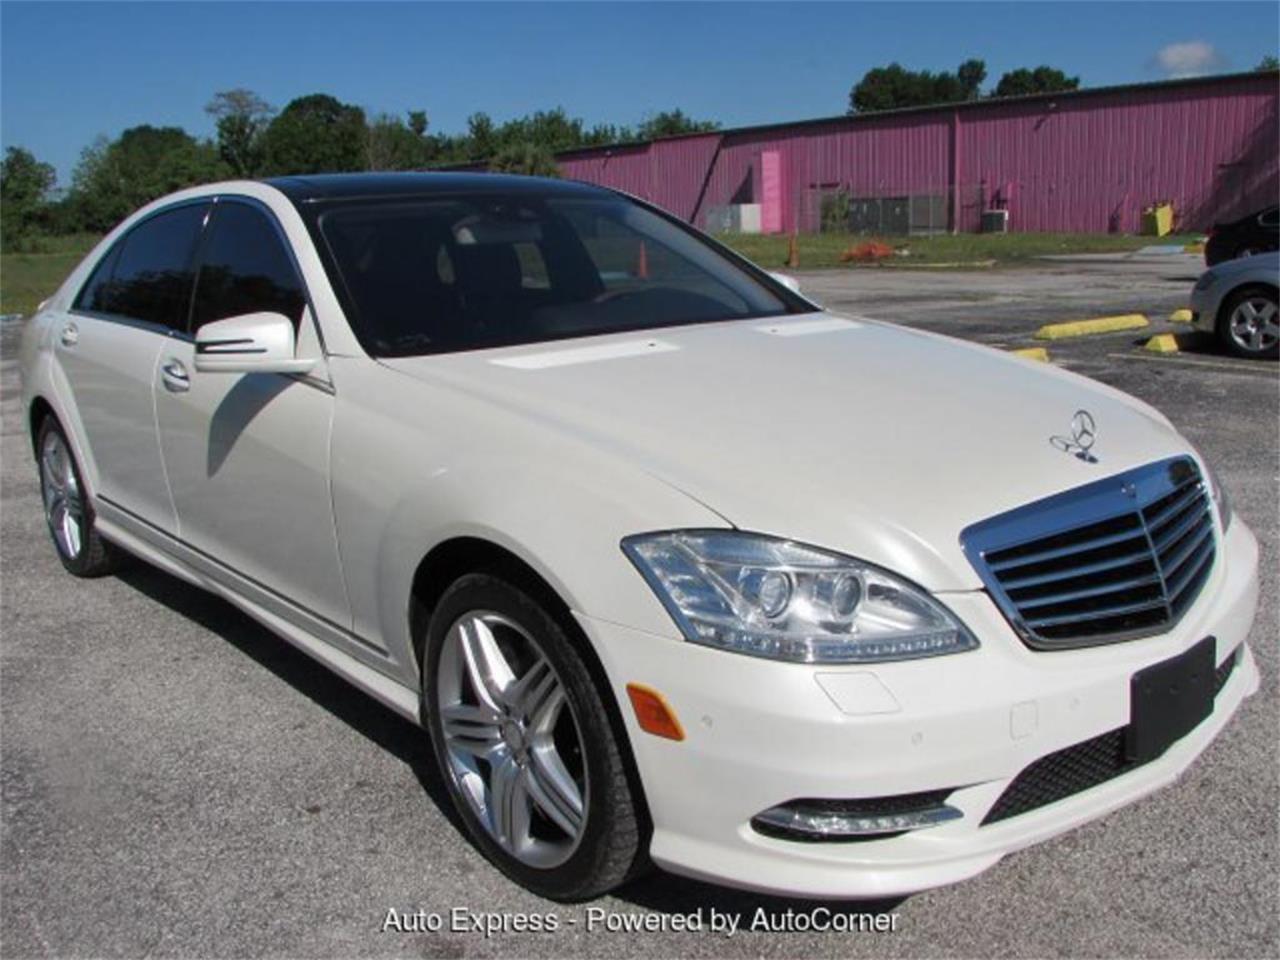 For Sale 2013 Mercedes Benz S Class In Orlando Florida